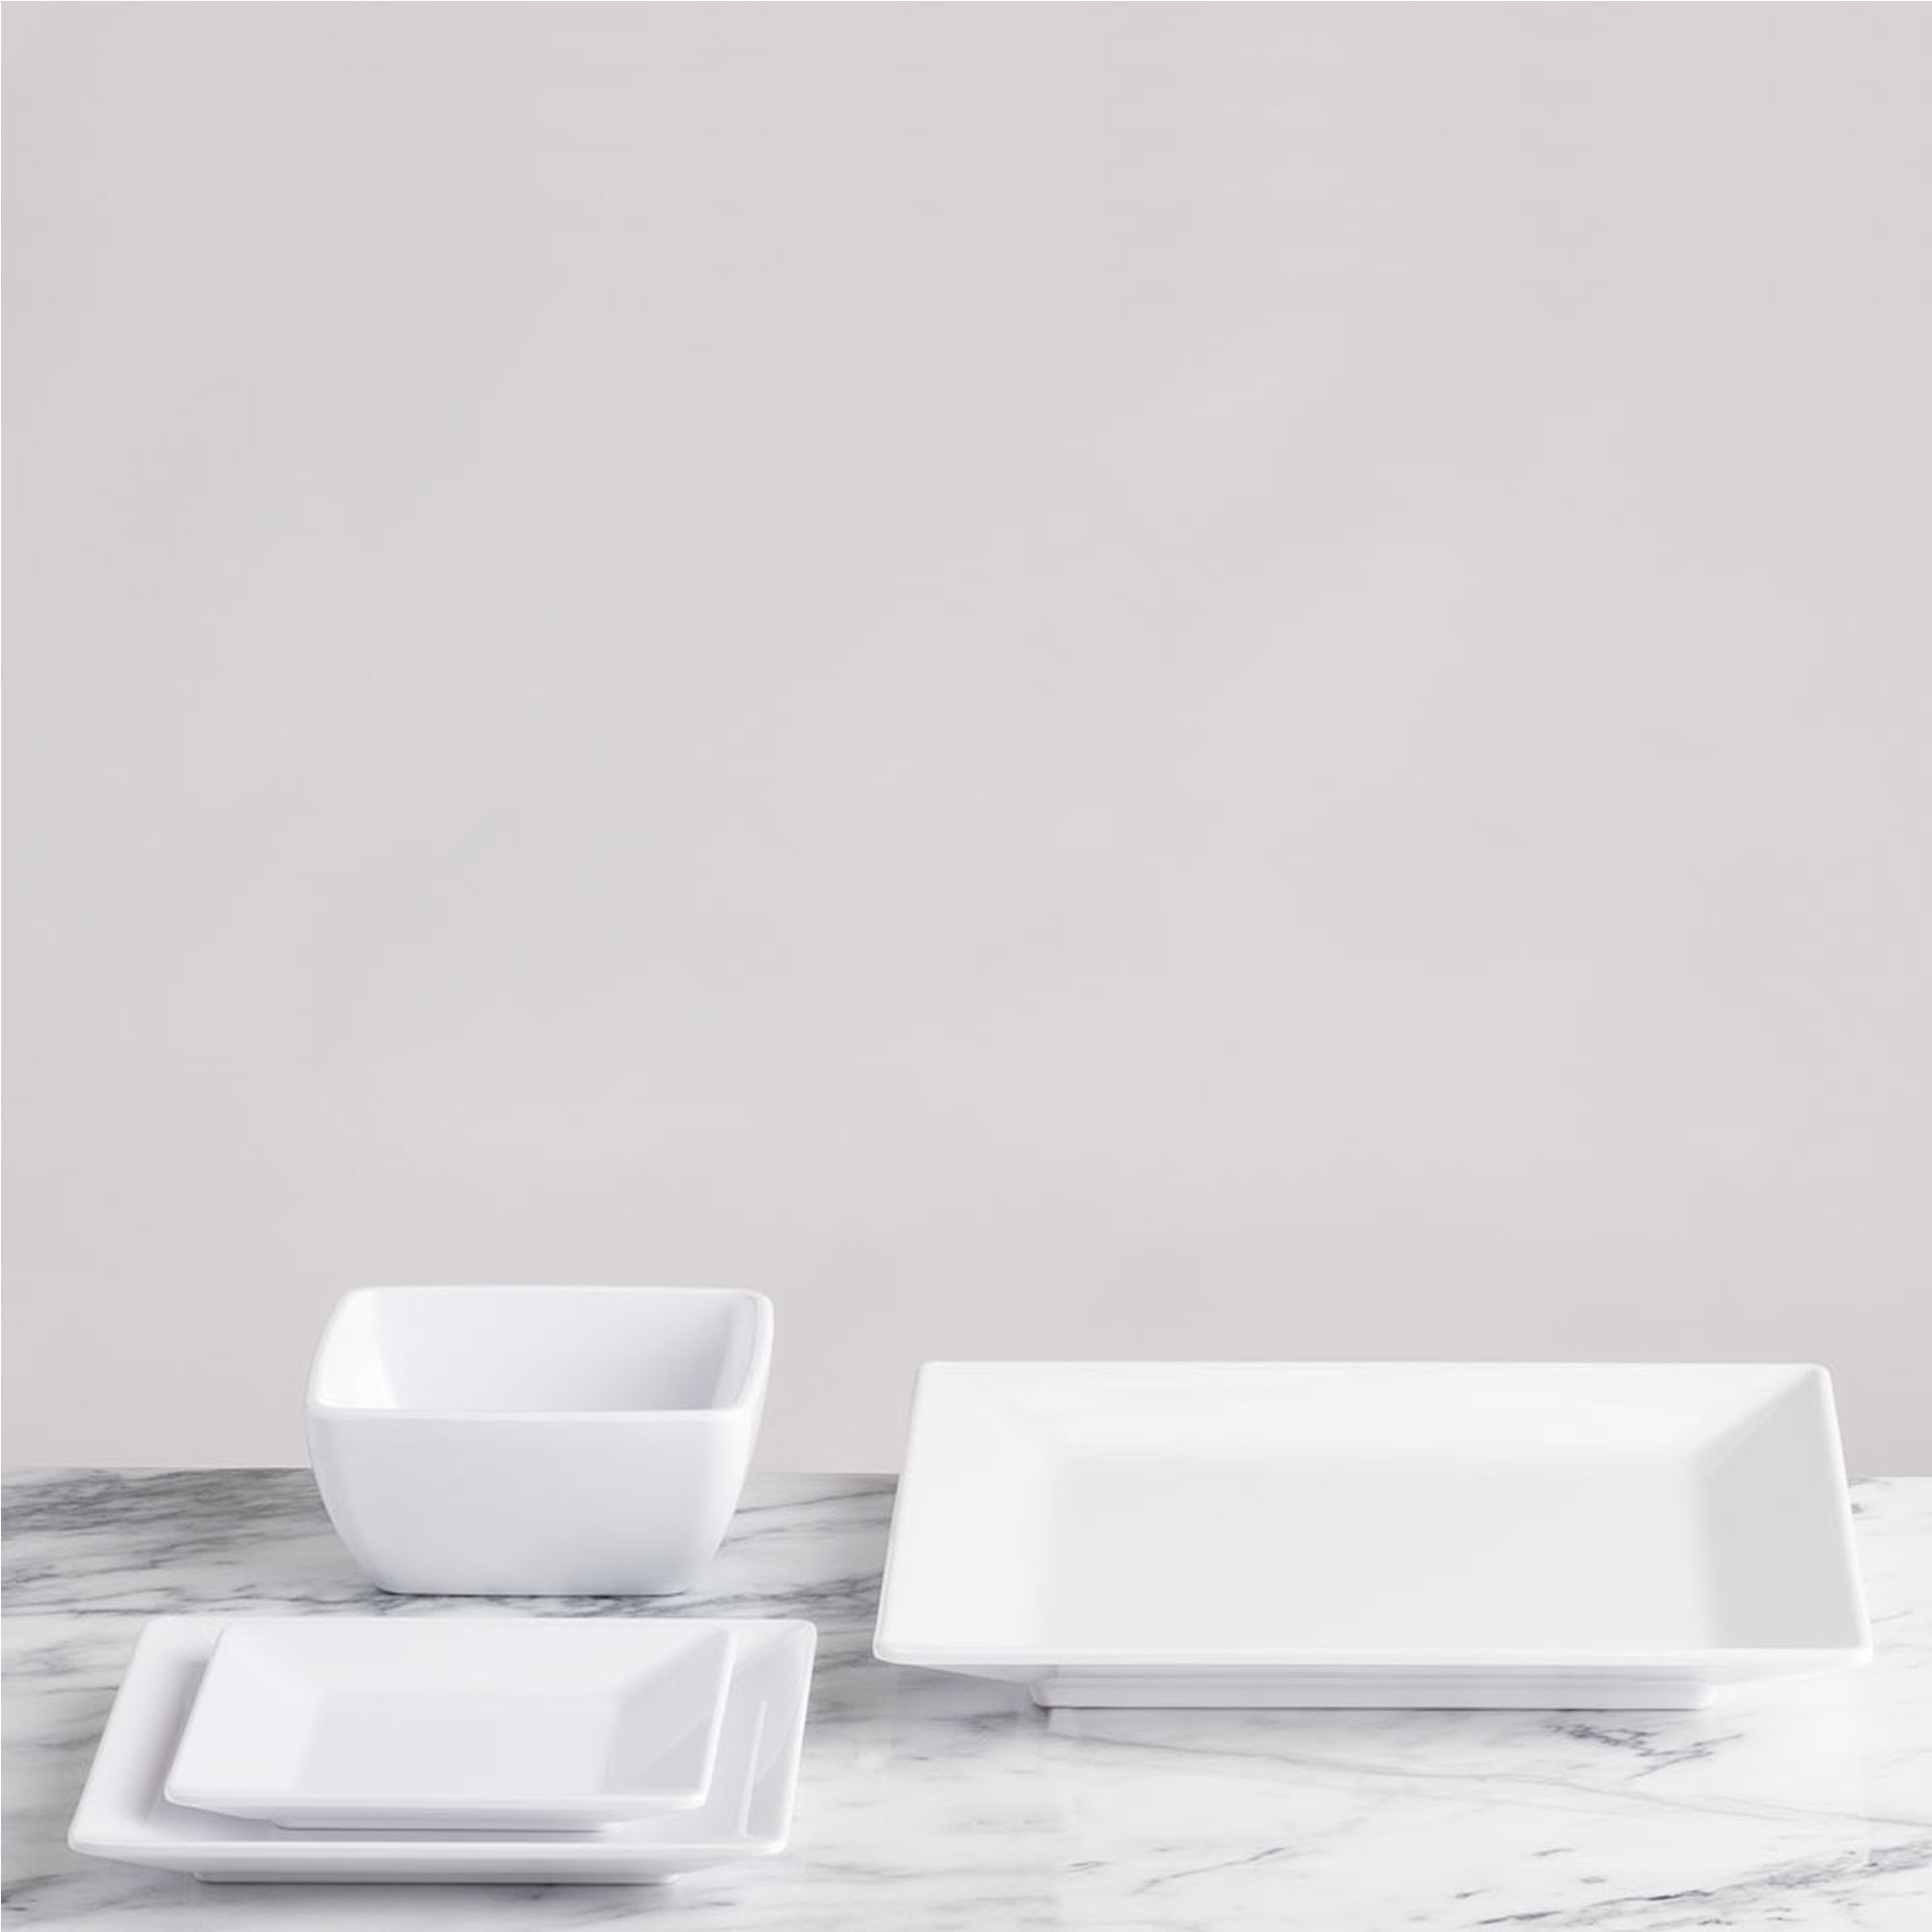 Q Squared Diamond White BPA-Free Melamine Large Rectangle Platter, 17-1/4 by 10-1/2, White by Q Squared (Image #4)